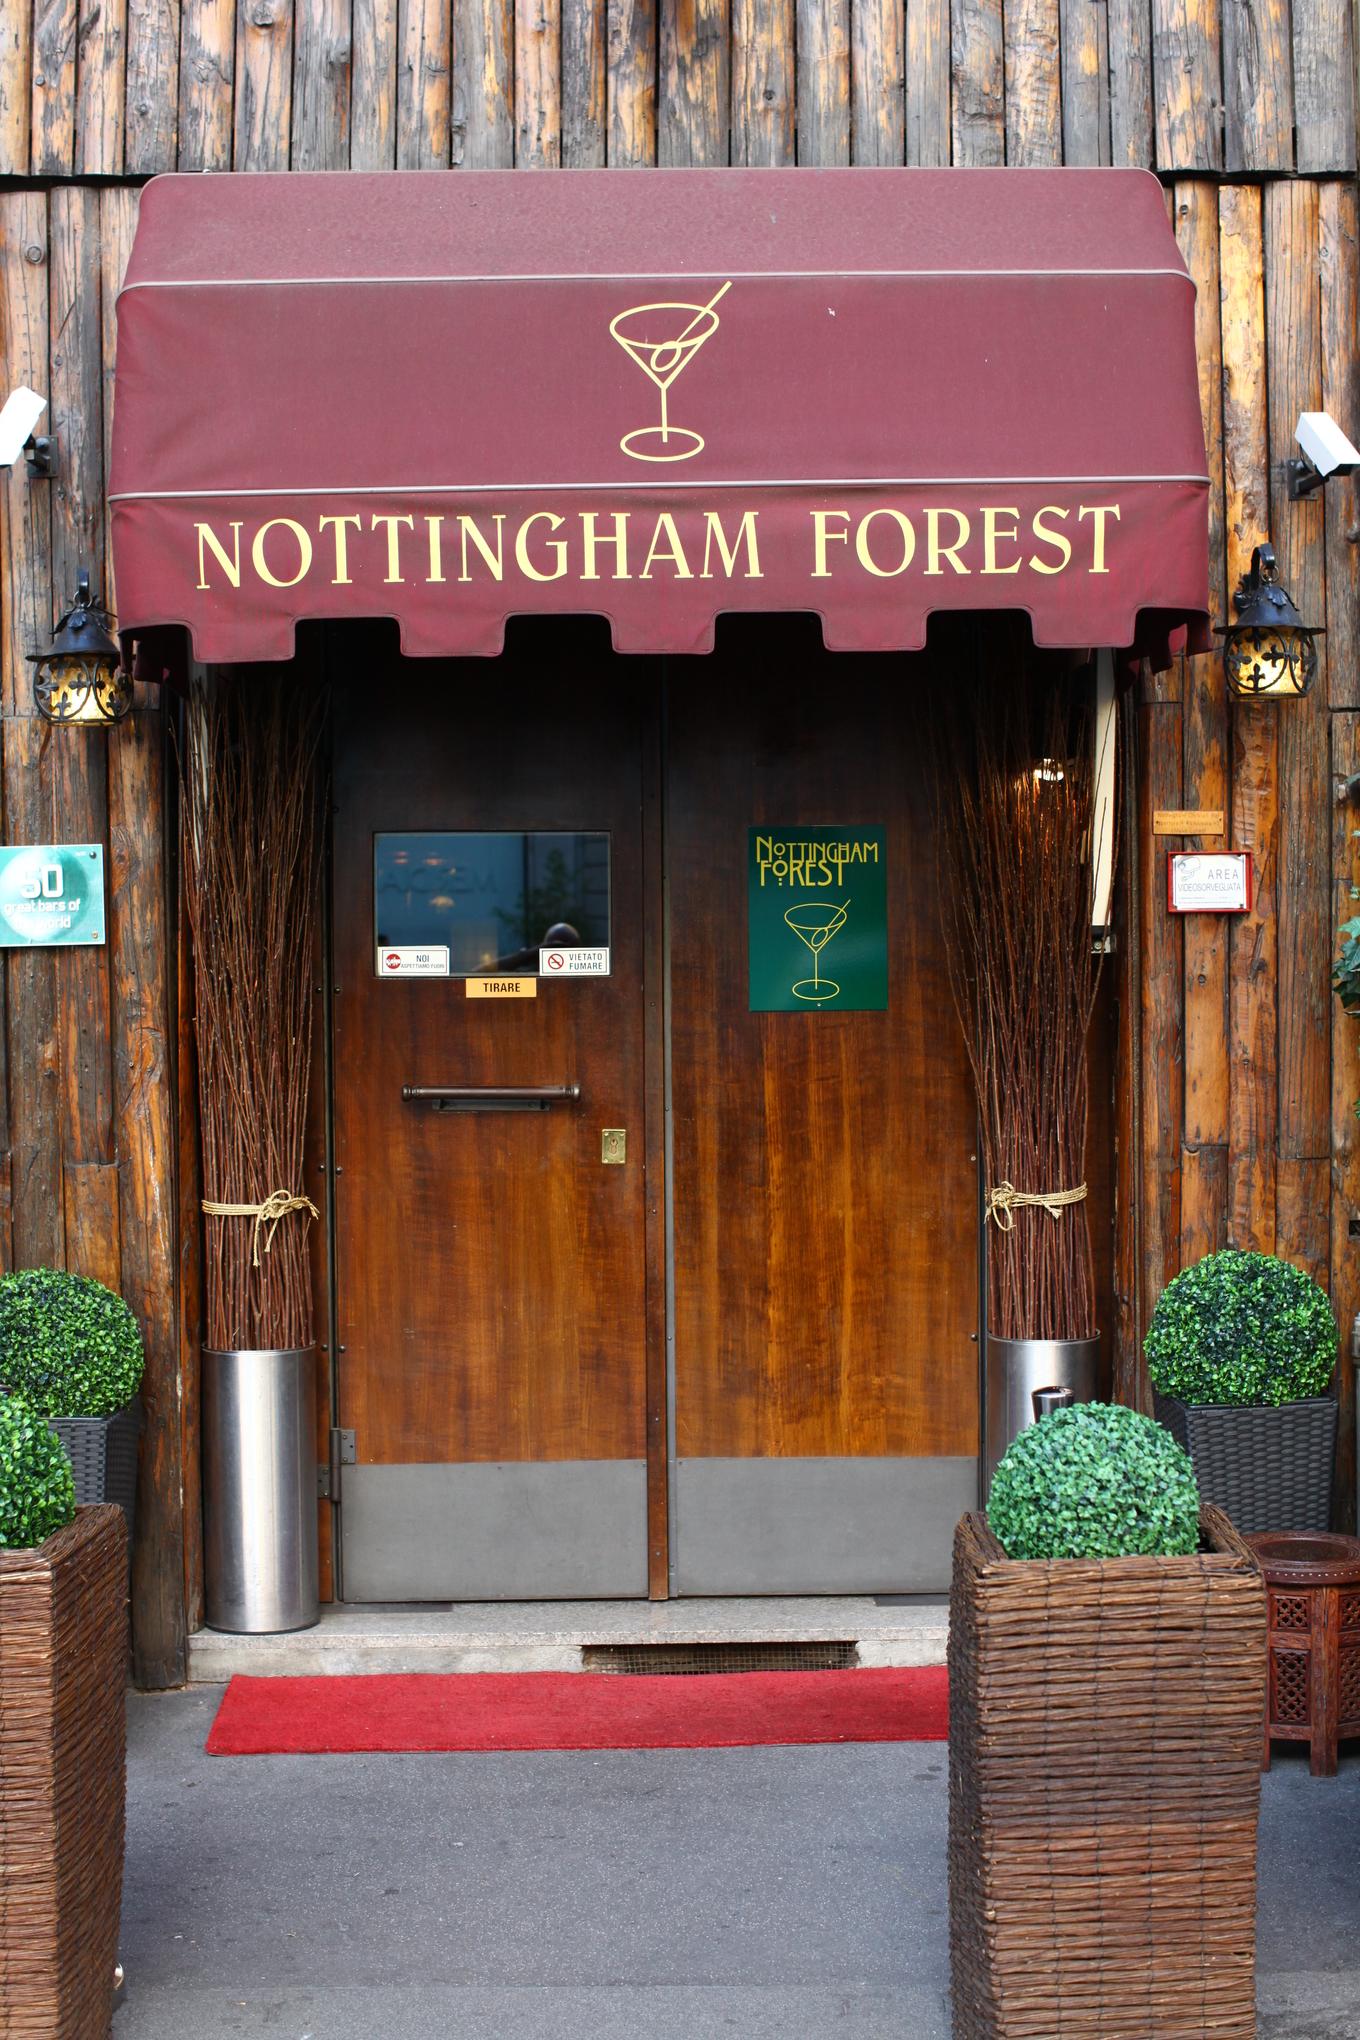 Nottingham Forest image 1